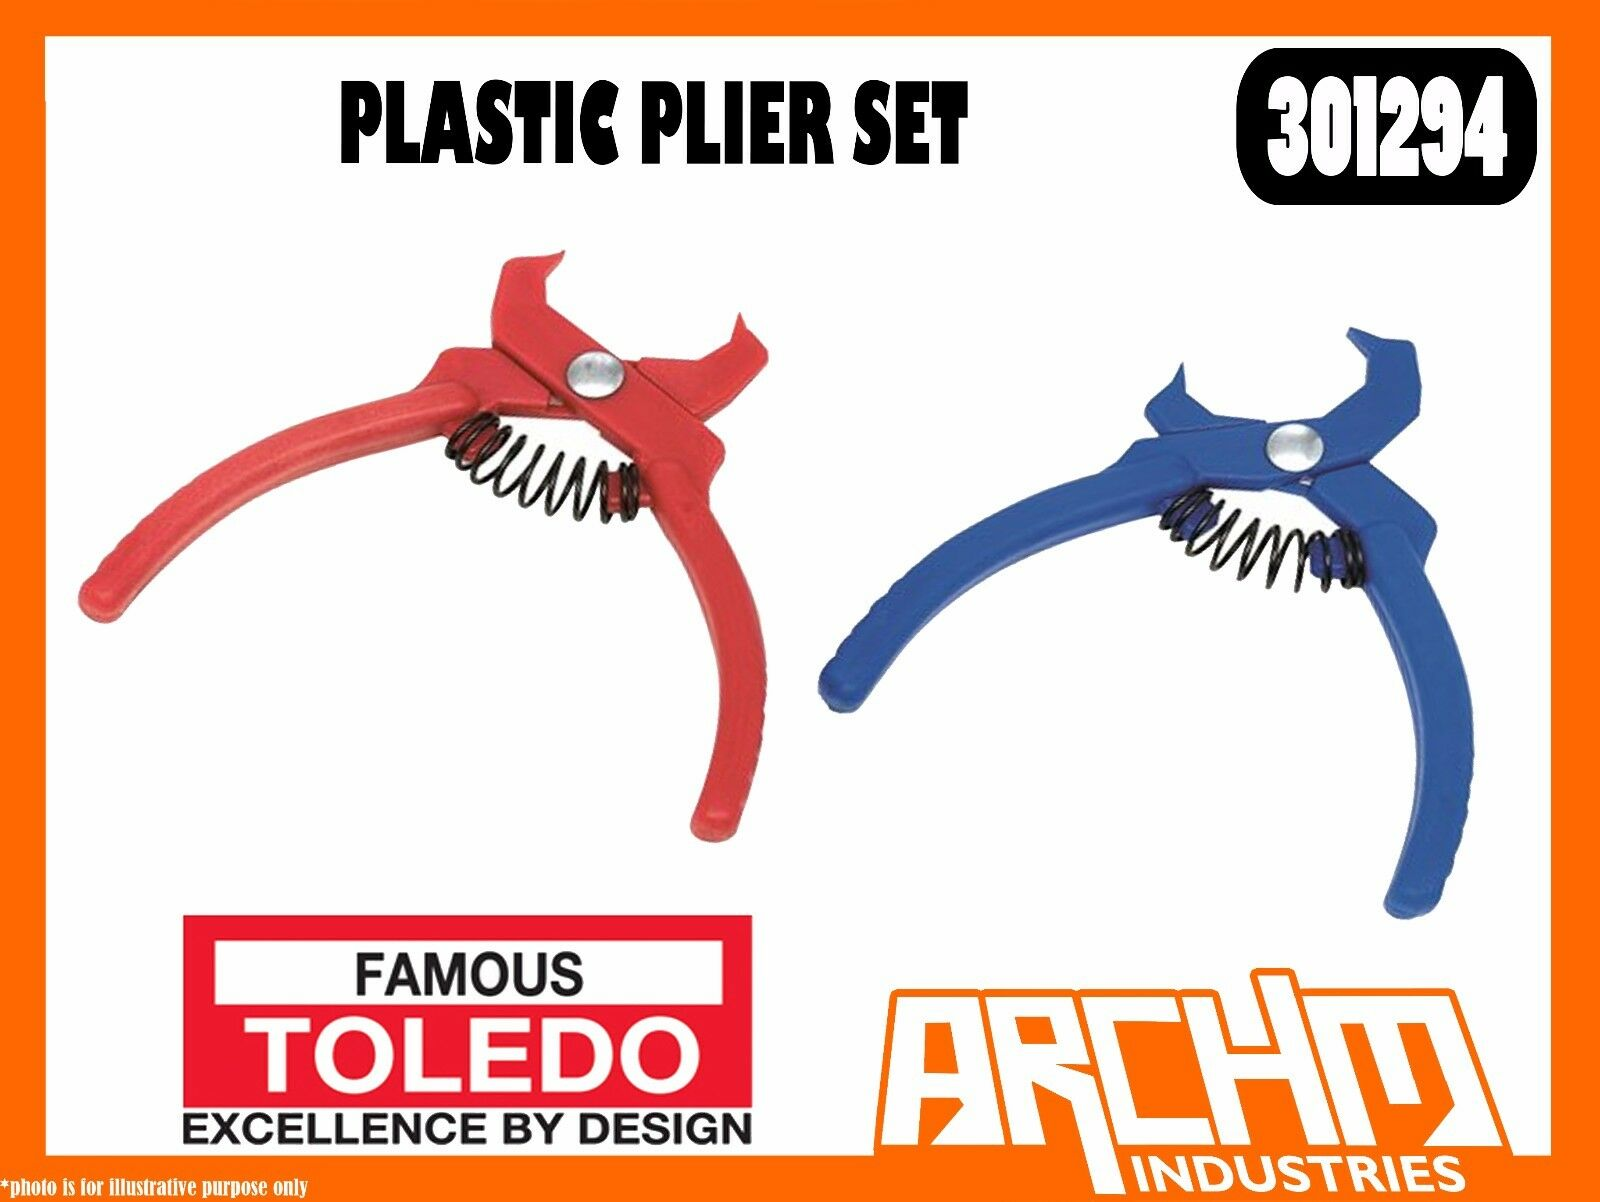 TOLEDO 301294  - PLASTIC PLIER SET - STRAIGHT 30° OFFSET HEAD LIGHT WEIGHT